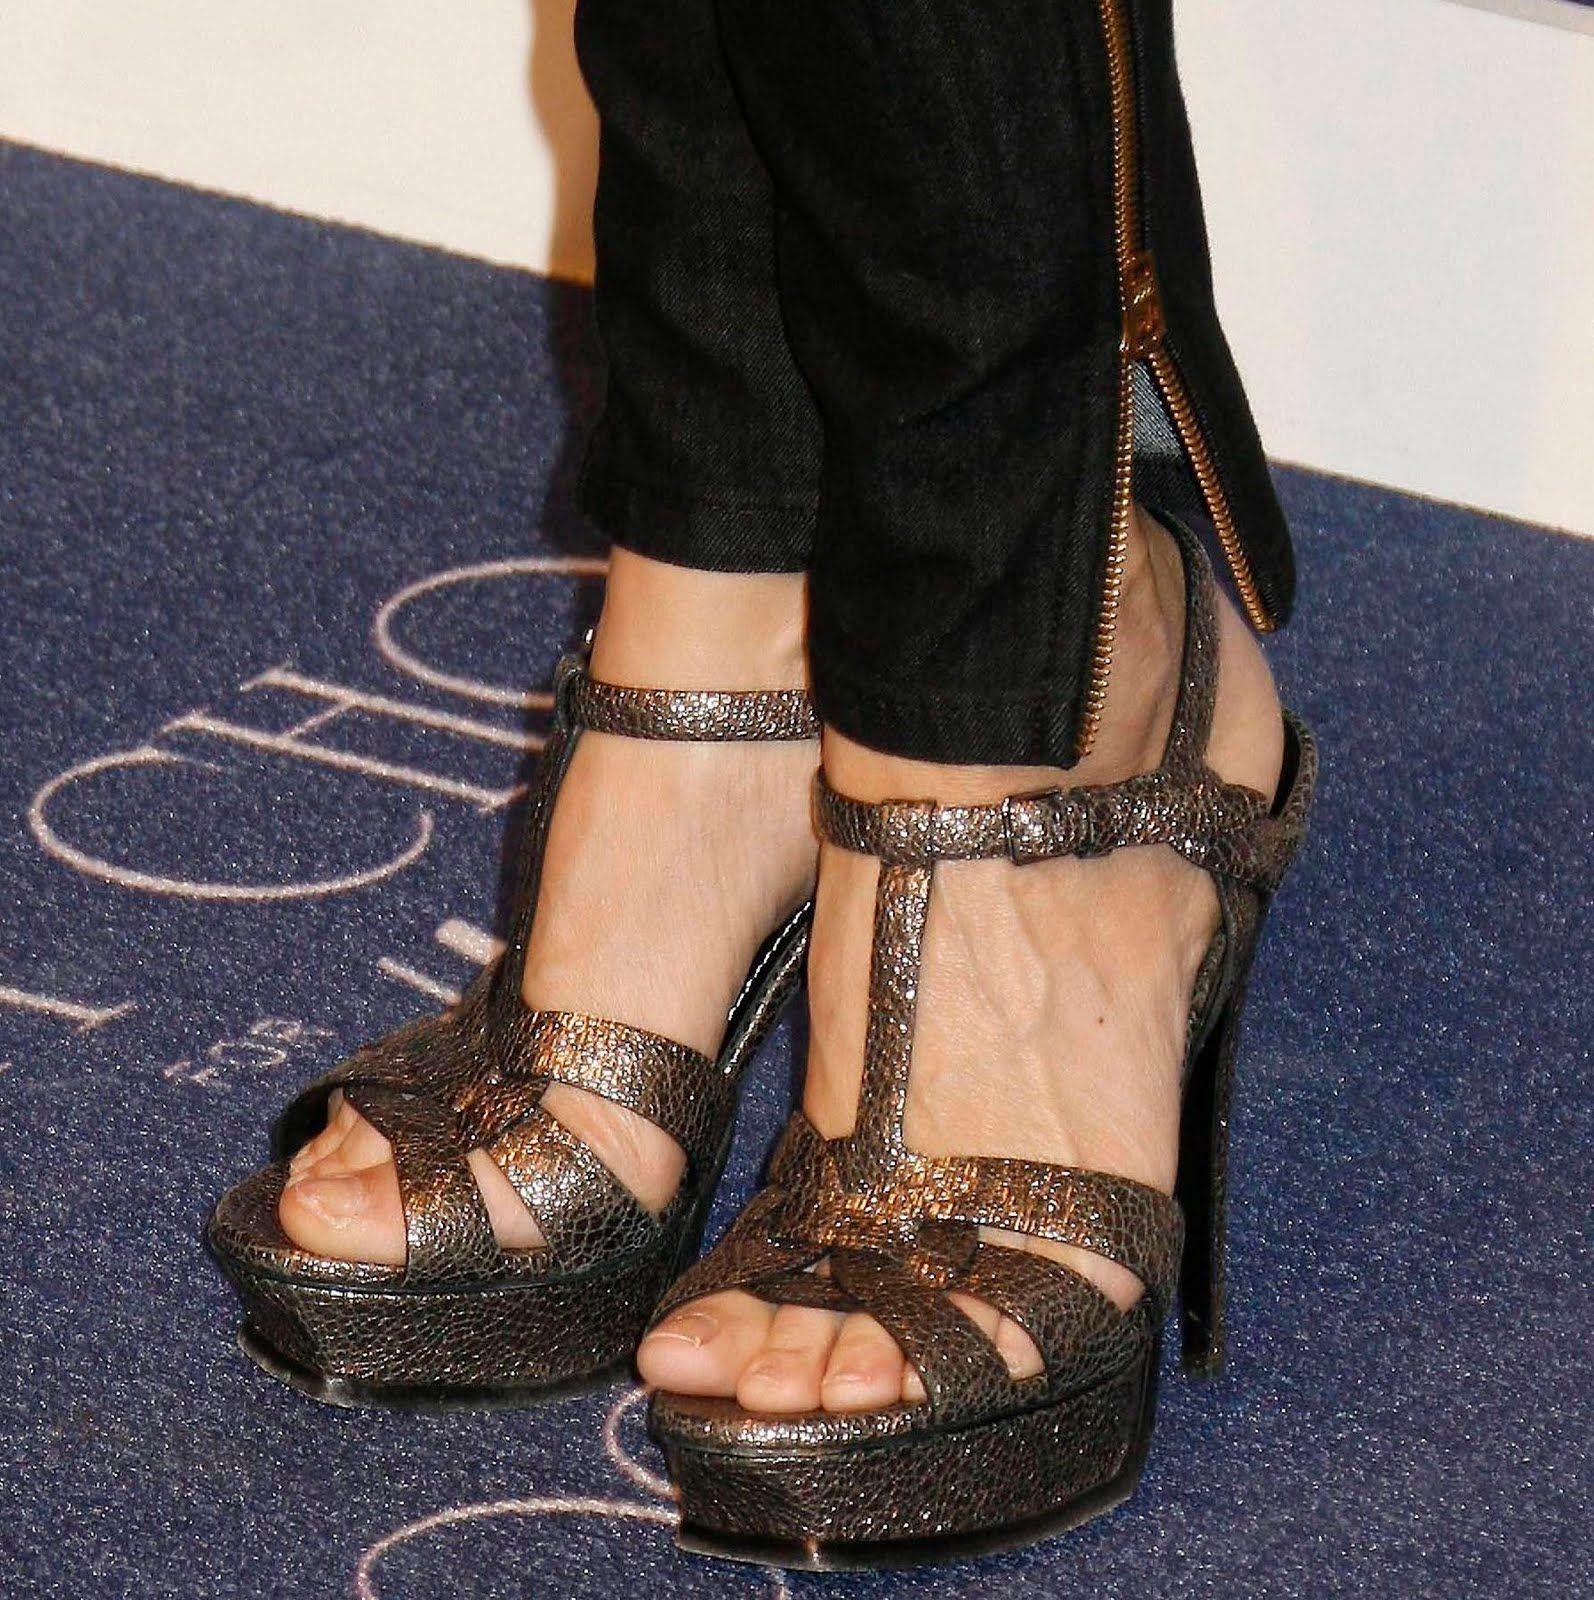 saffron burrows feet